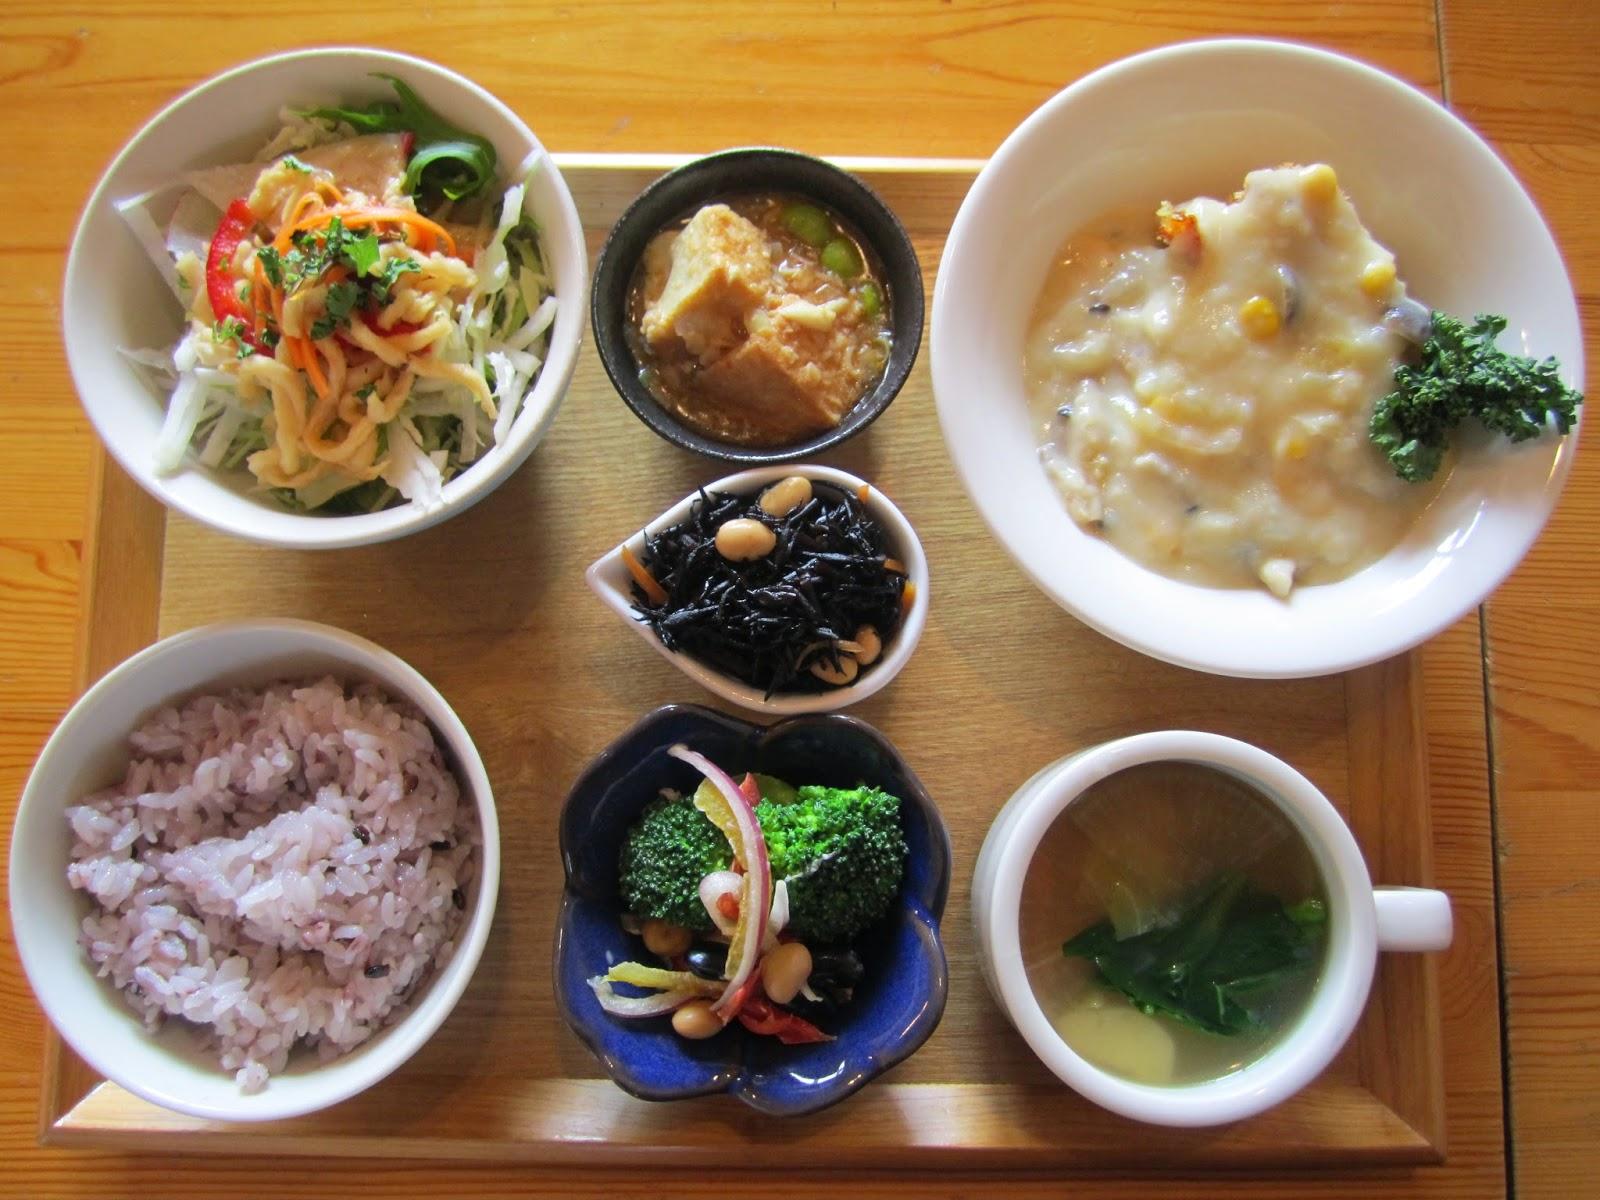 Nagisa Curry Nagisa Cafe Hachinohe City なぎさカレー ナギサカフェ 八戸市